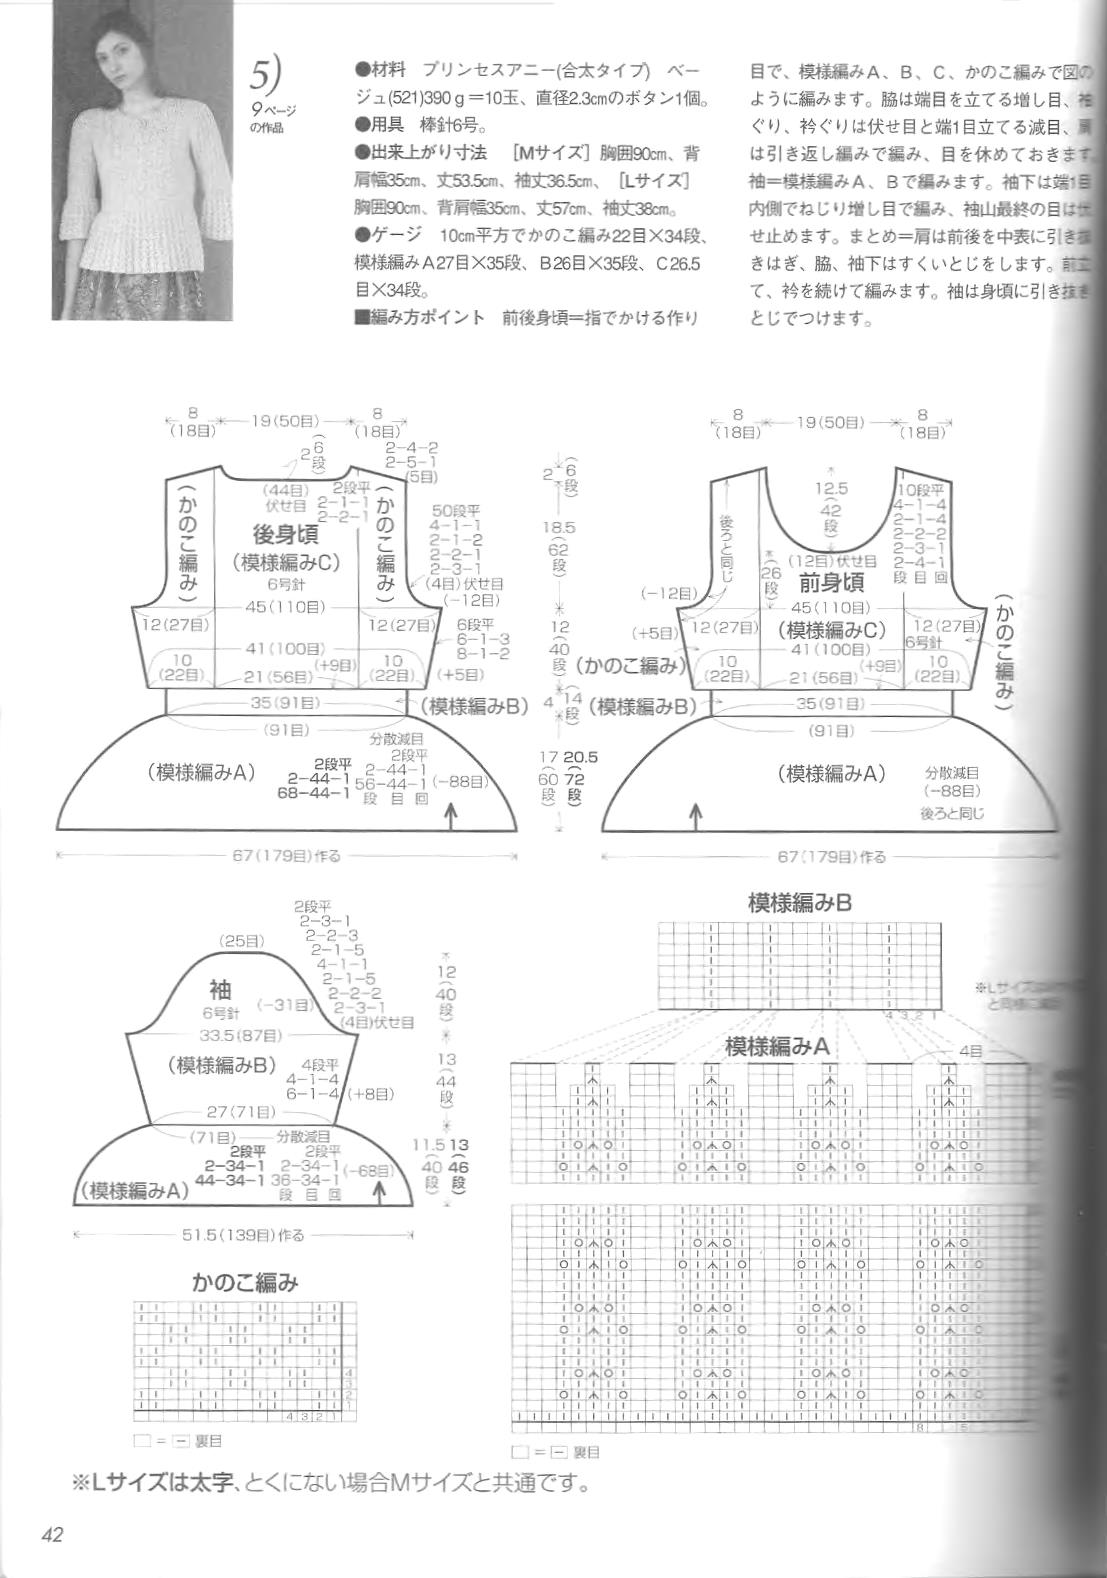 Let's knit series NV4375 2008 M-L sp-kr_42